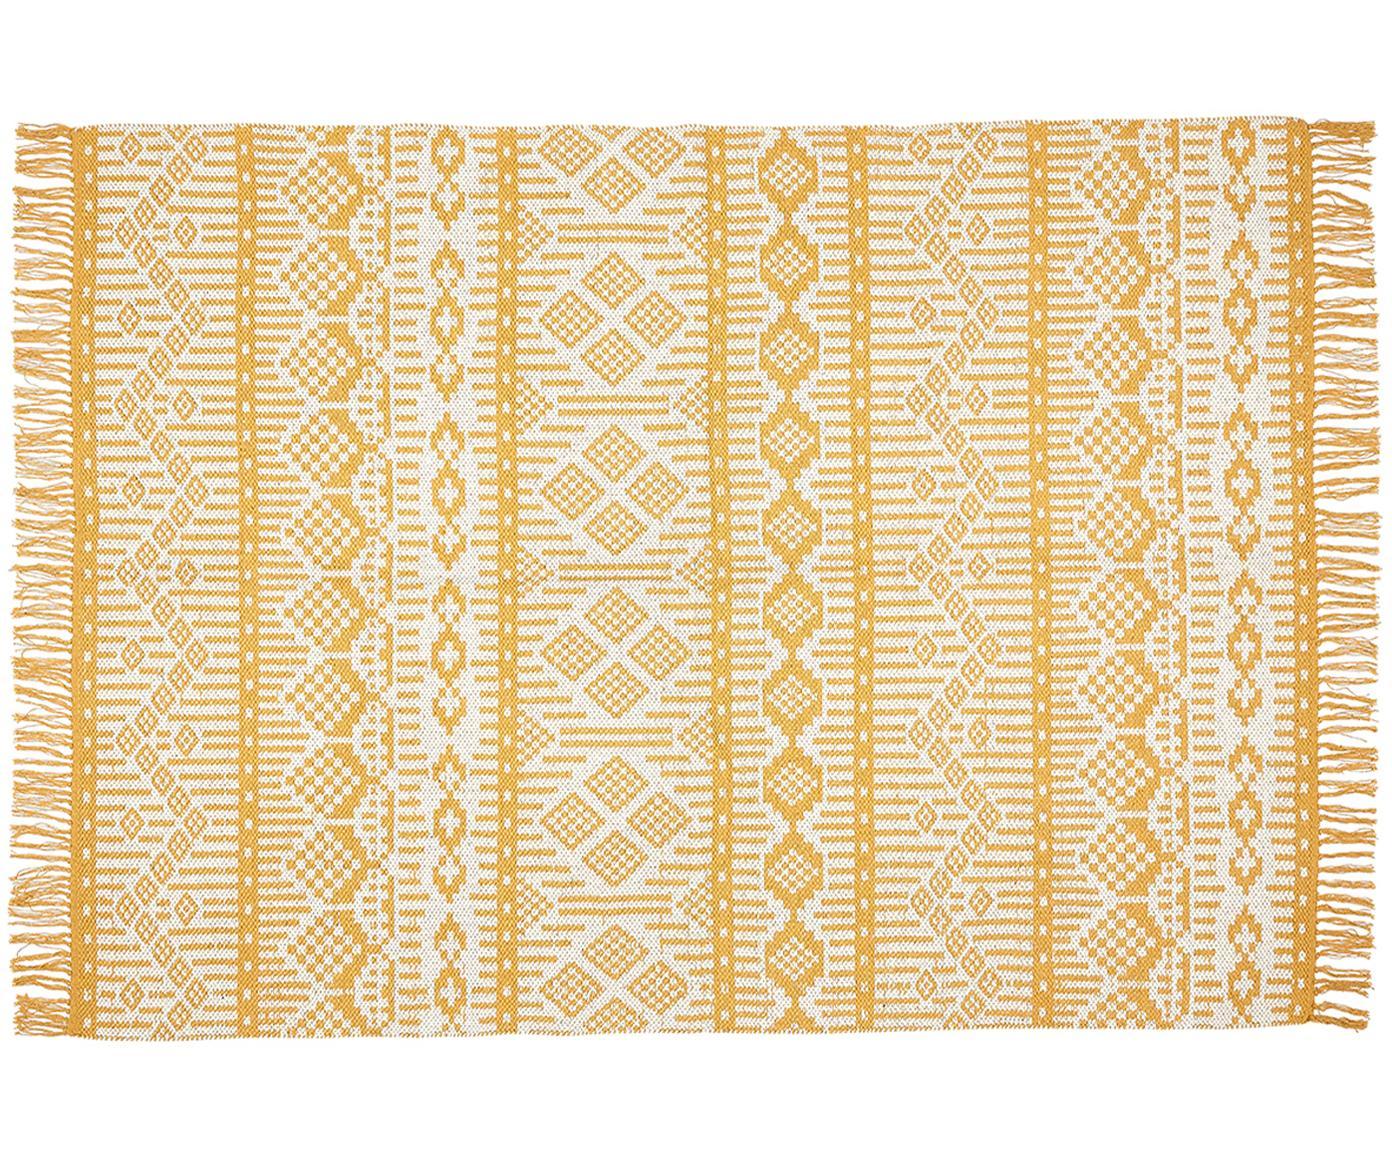 Ethno vloerkleed Panama van gerecycled katoen, Gerecycled katoen, Crèmekleurig, mosterdgeel, B 60 x L 90 cm (maat XXS)